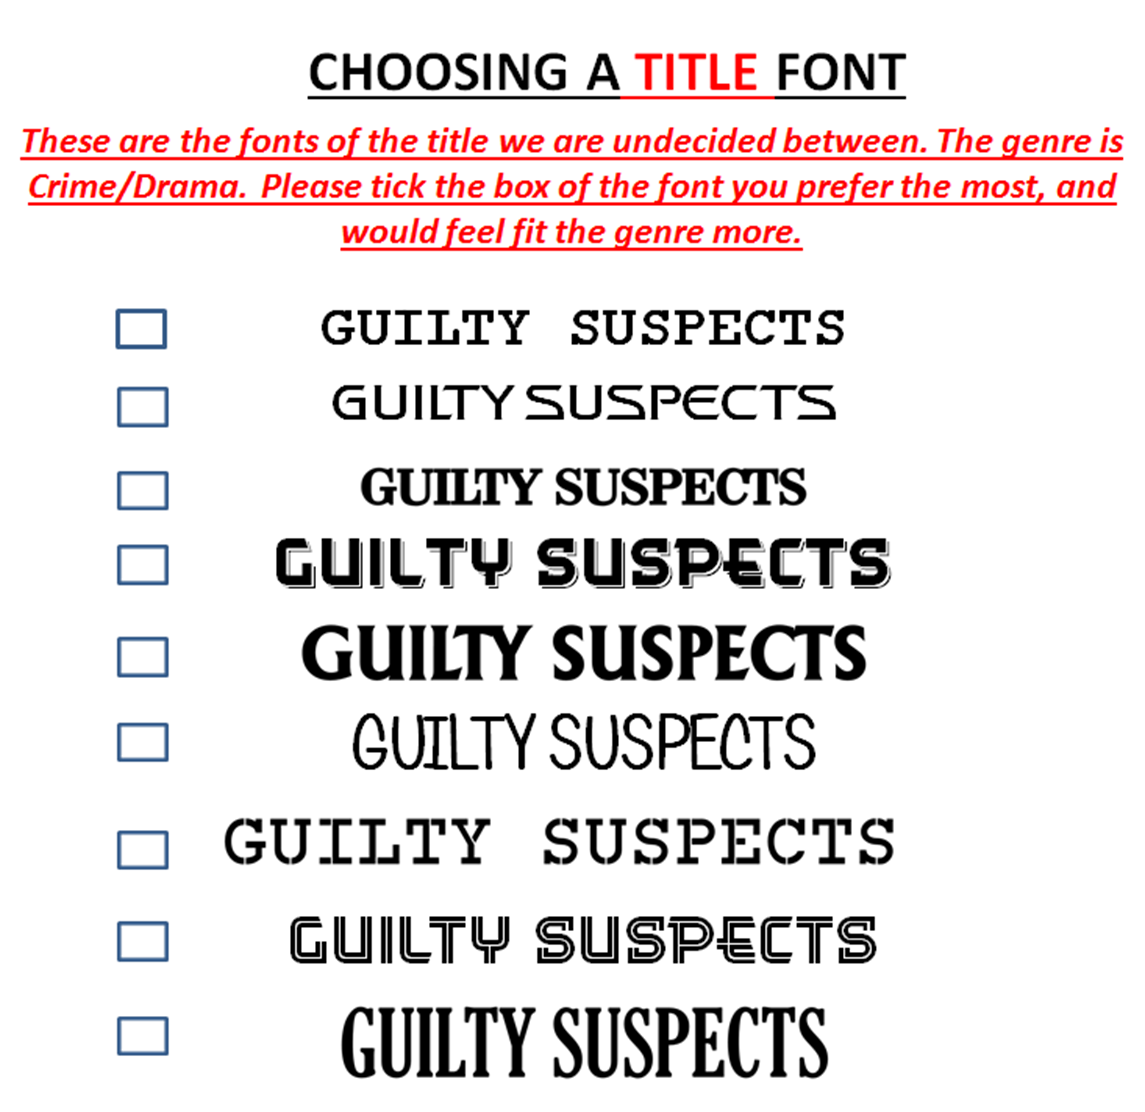 Georgia Waley A2 Media Studies Choosing A Title Font Guilty